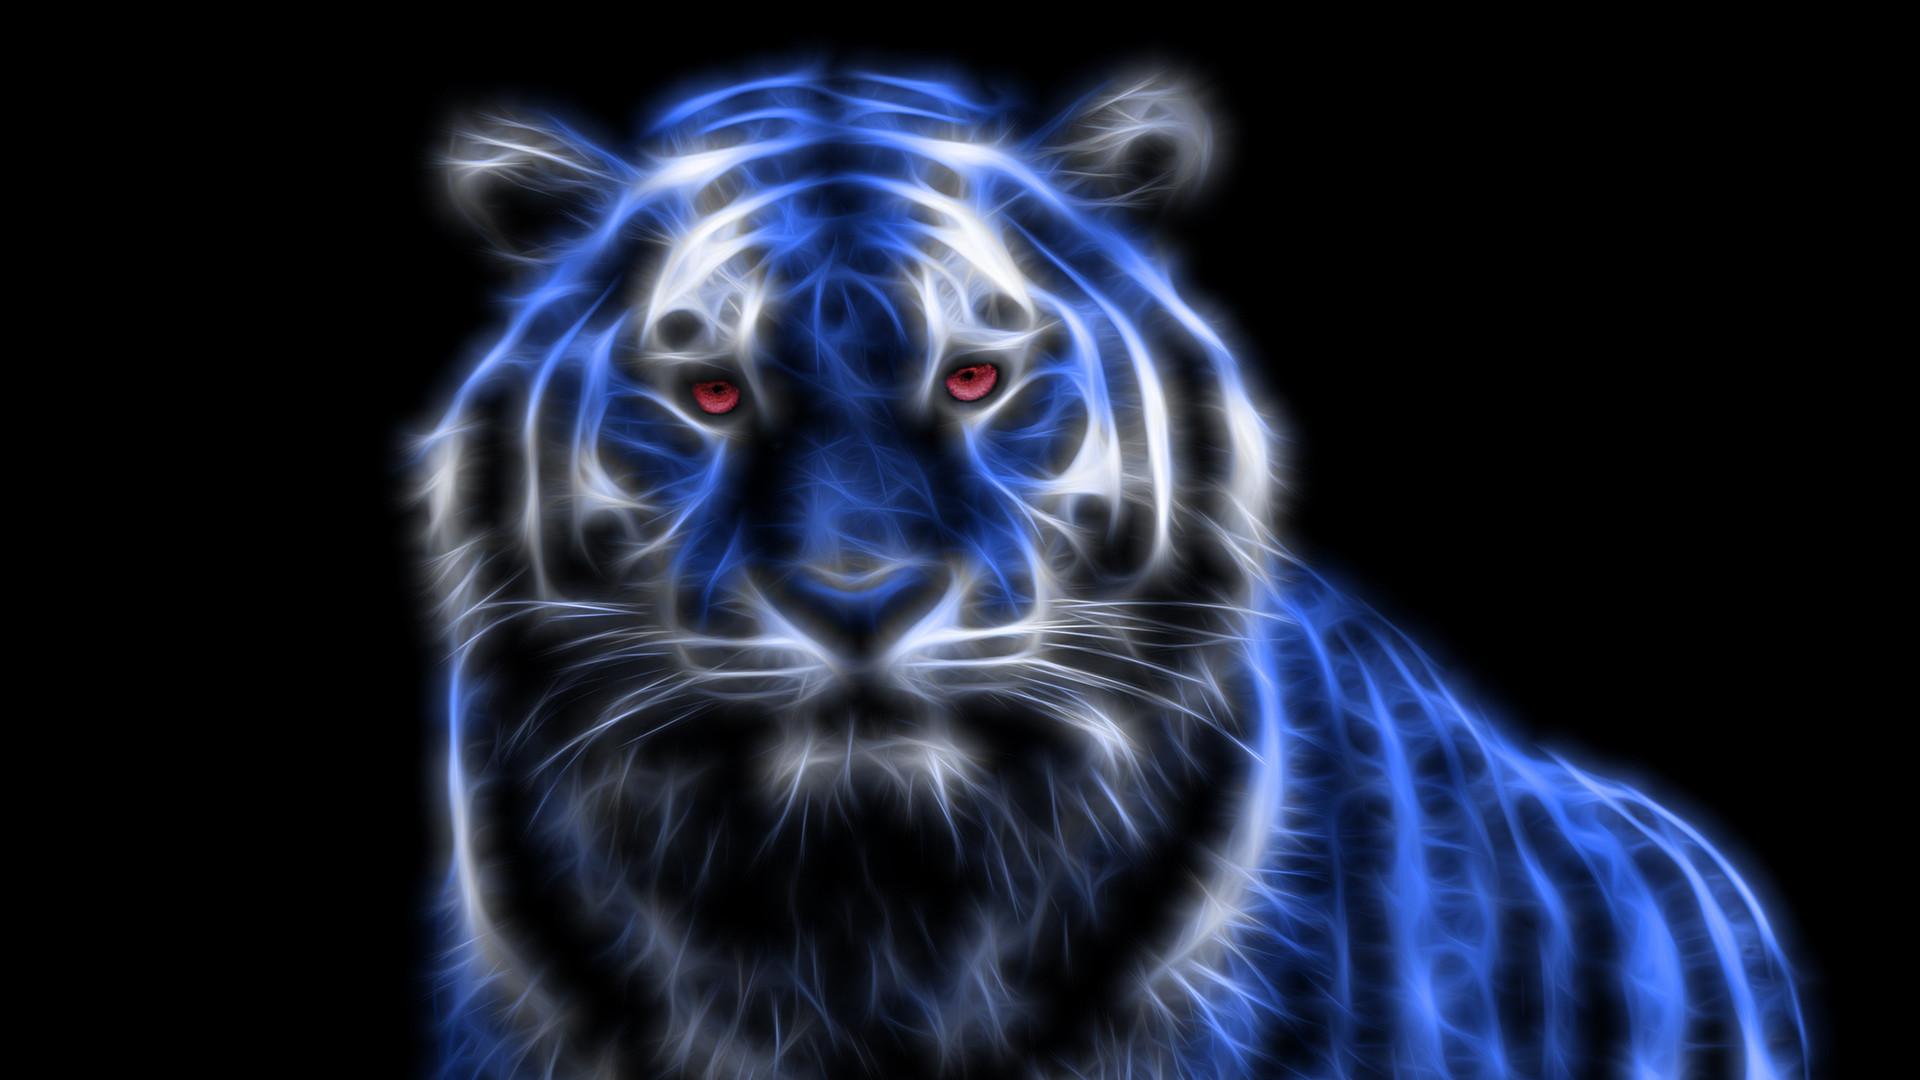 1920x1080 Neon Tiger Wallpaper #30888